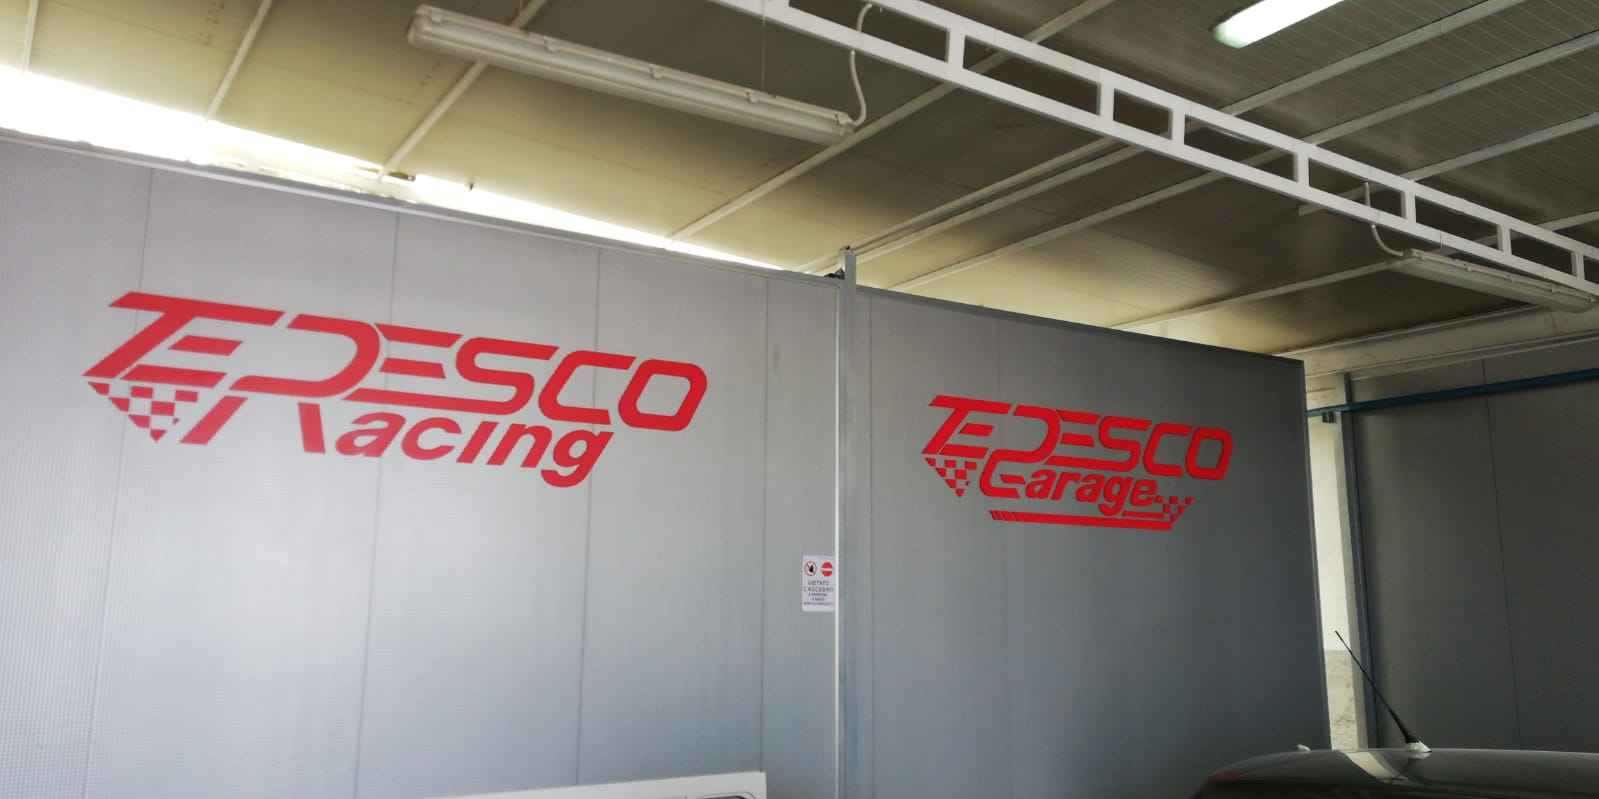 TEDESCO RACING